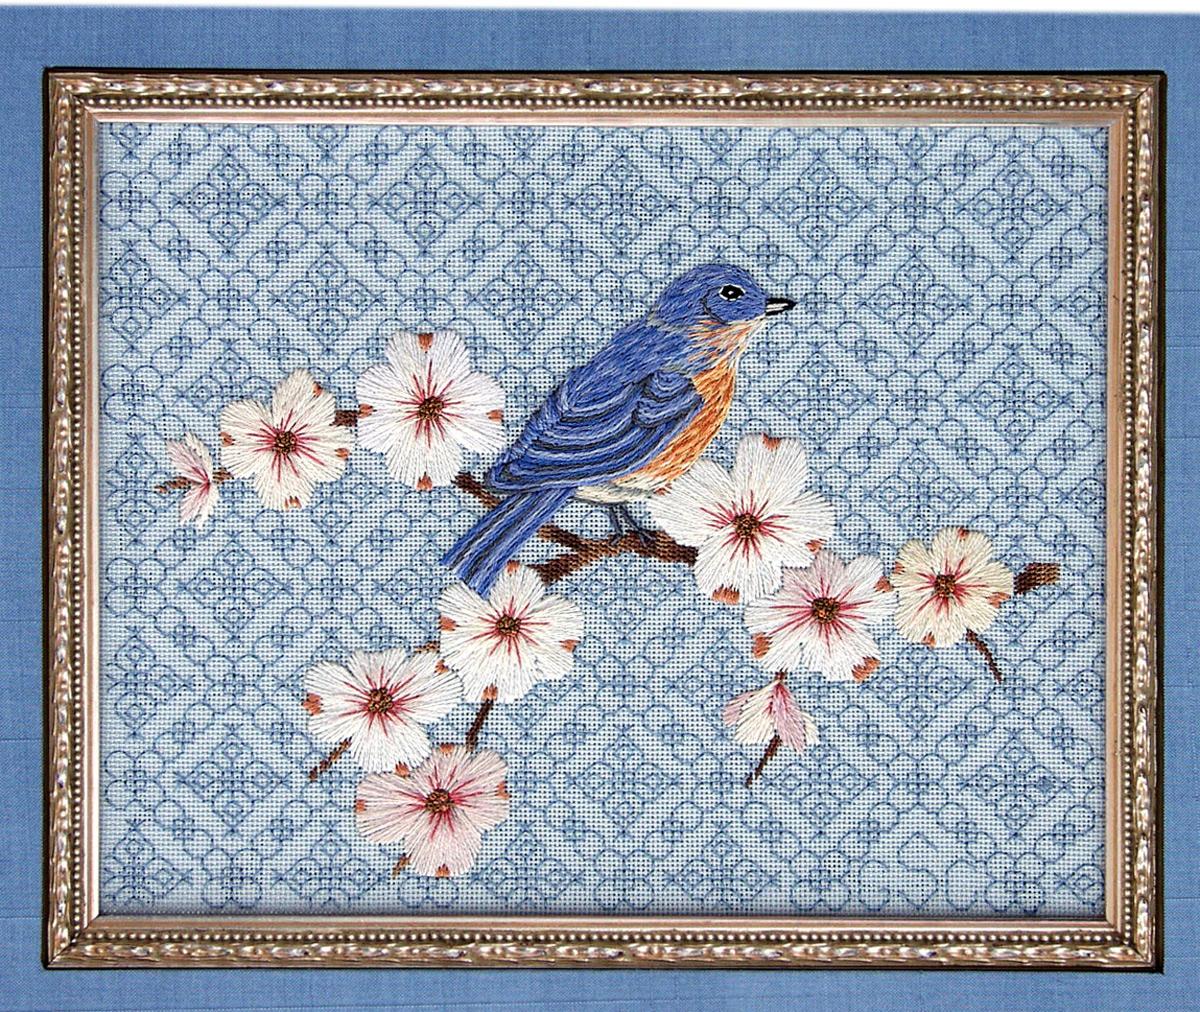 Bluebird and Dogwood